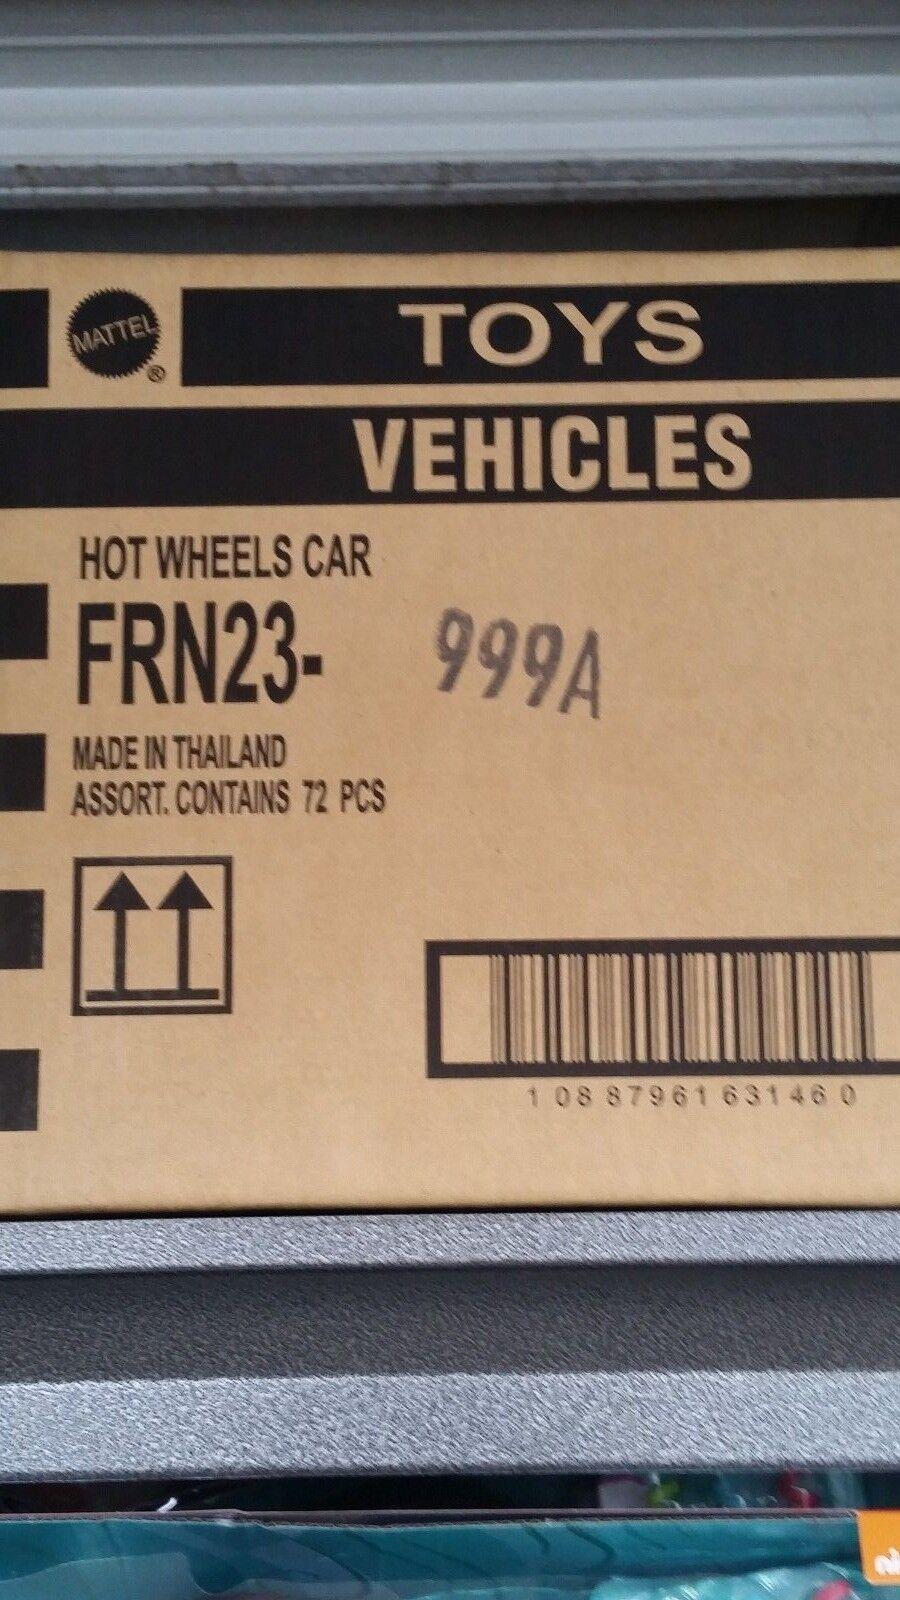 Hot wheels 50. jahrestag druckguss 1 64 zamac flammen sammlung der rechtssache 72 autos